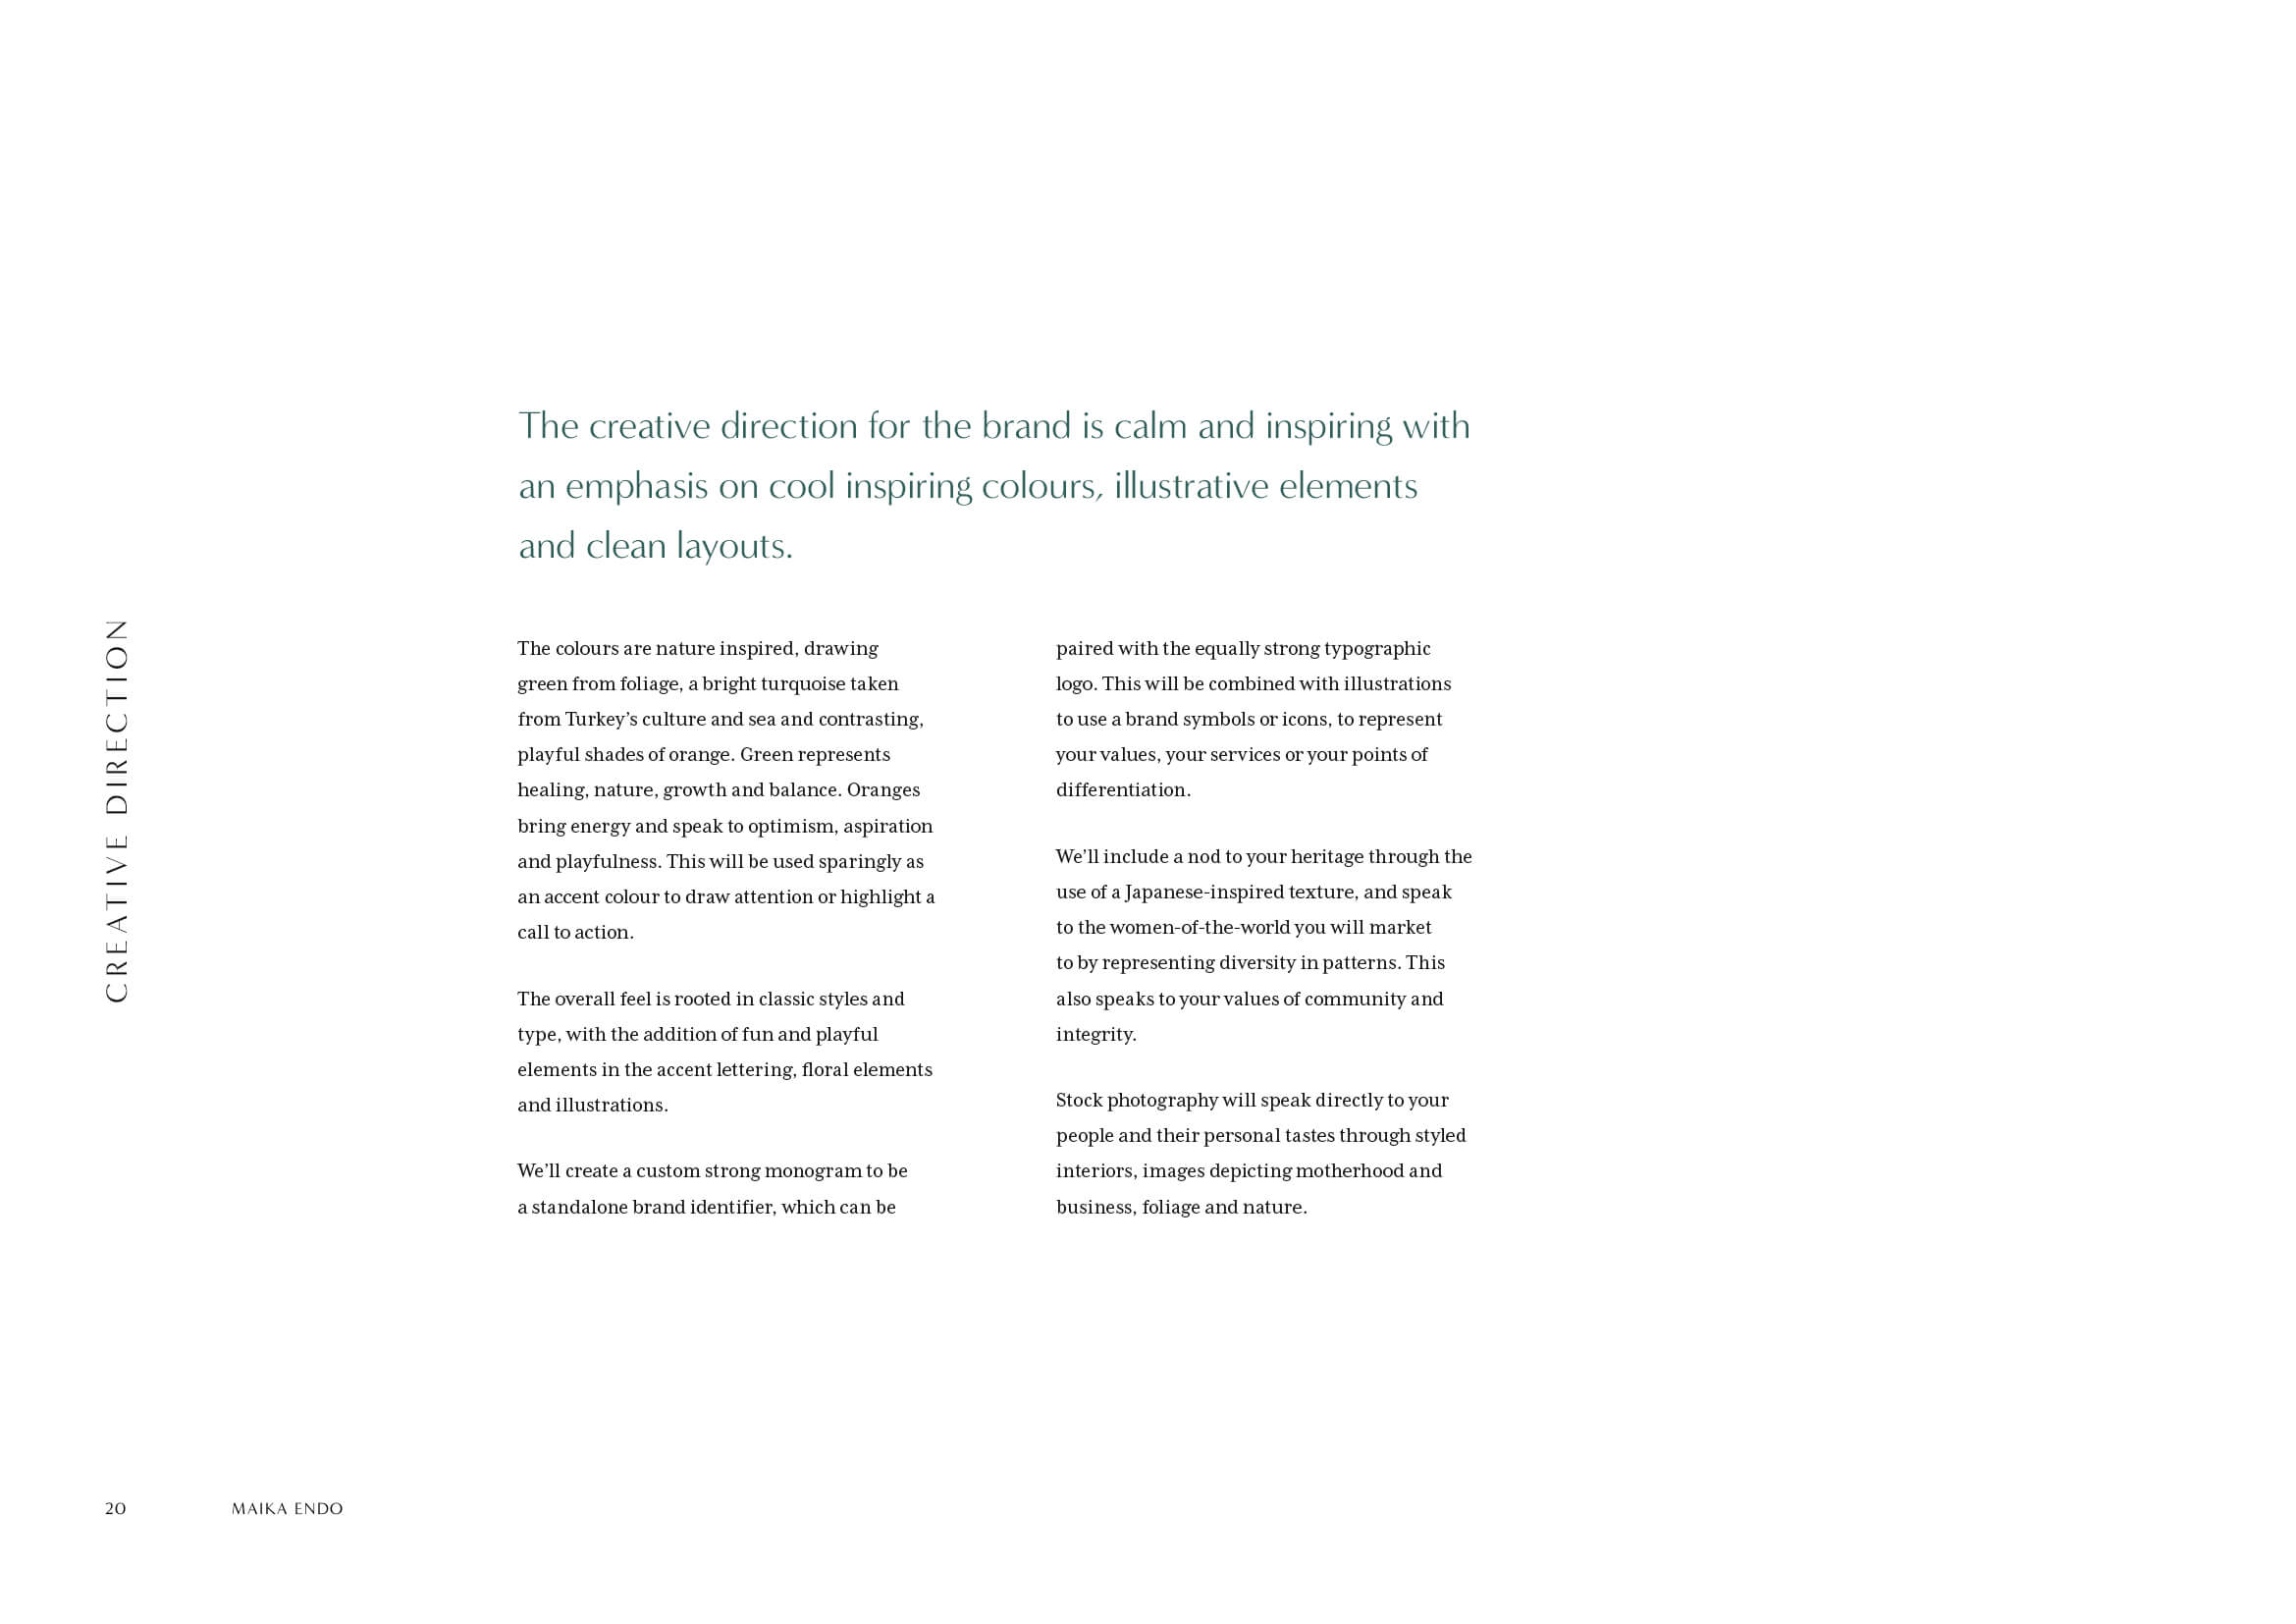 Maika Endo Strategy Manual20.jpg